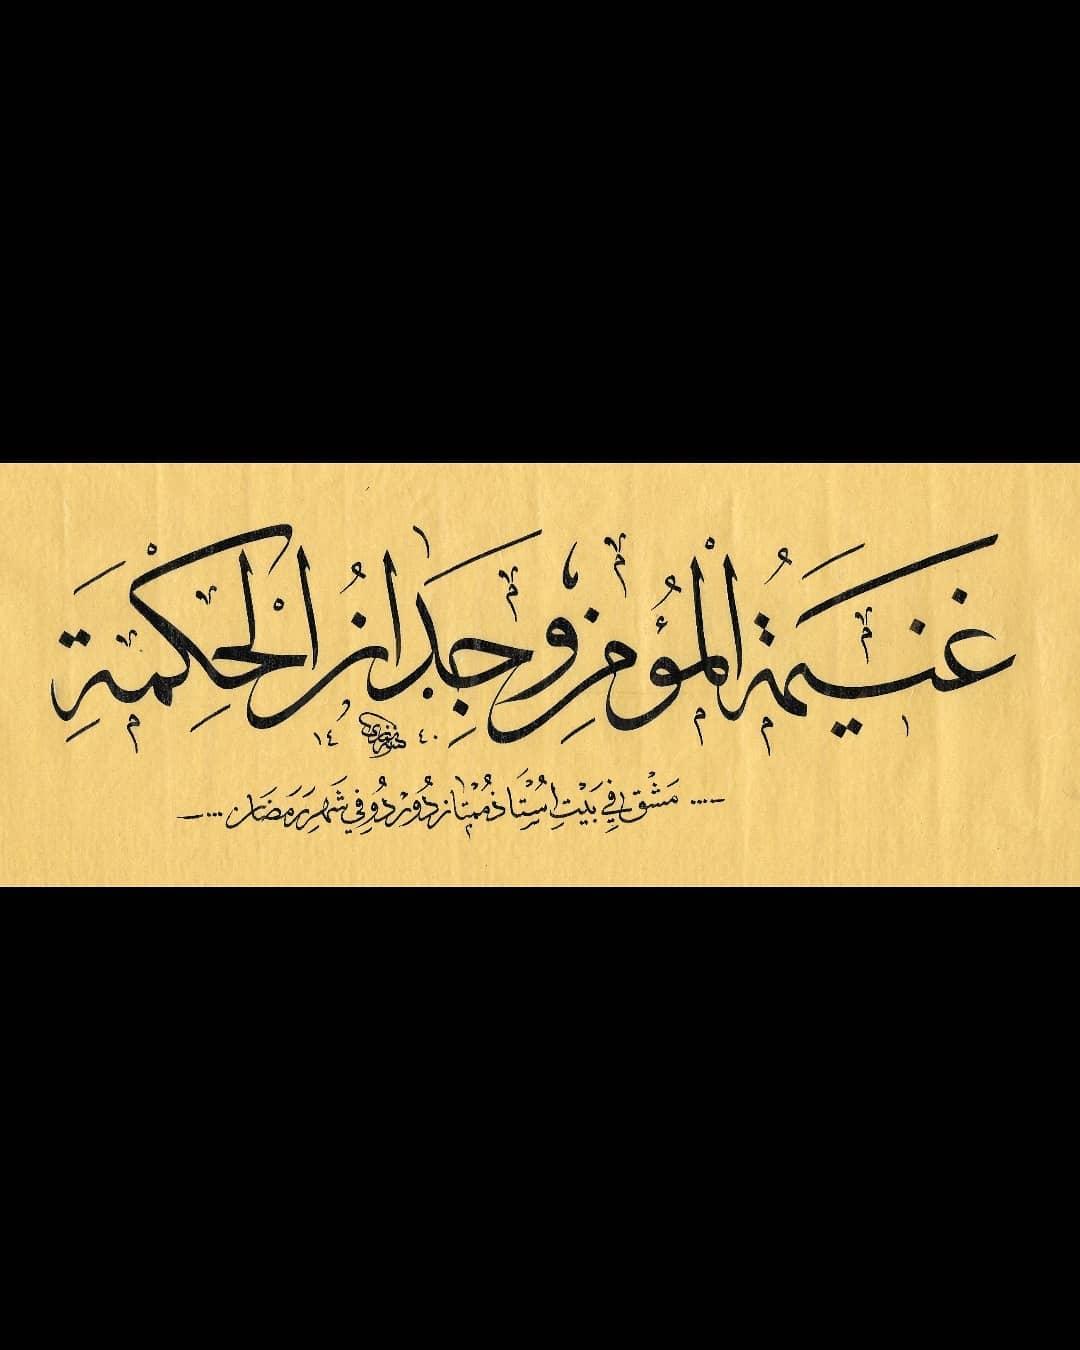 al kattat احمدعلی نمازی  .. . . . . . . . .#islamic #islamicart #artwork #calligraphy #hüsnühat #hattat #… 826